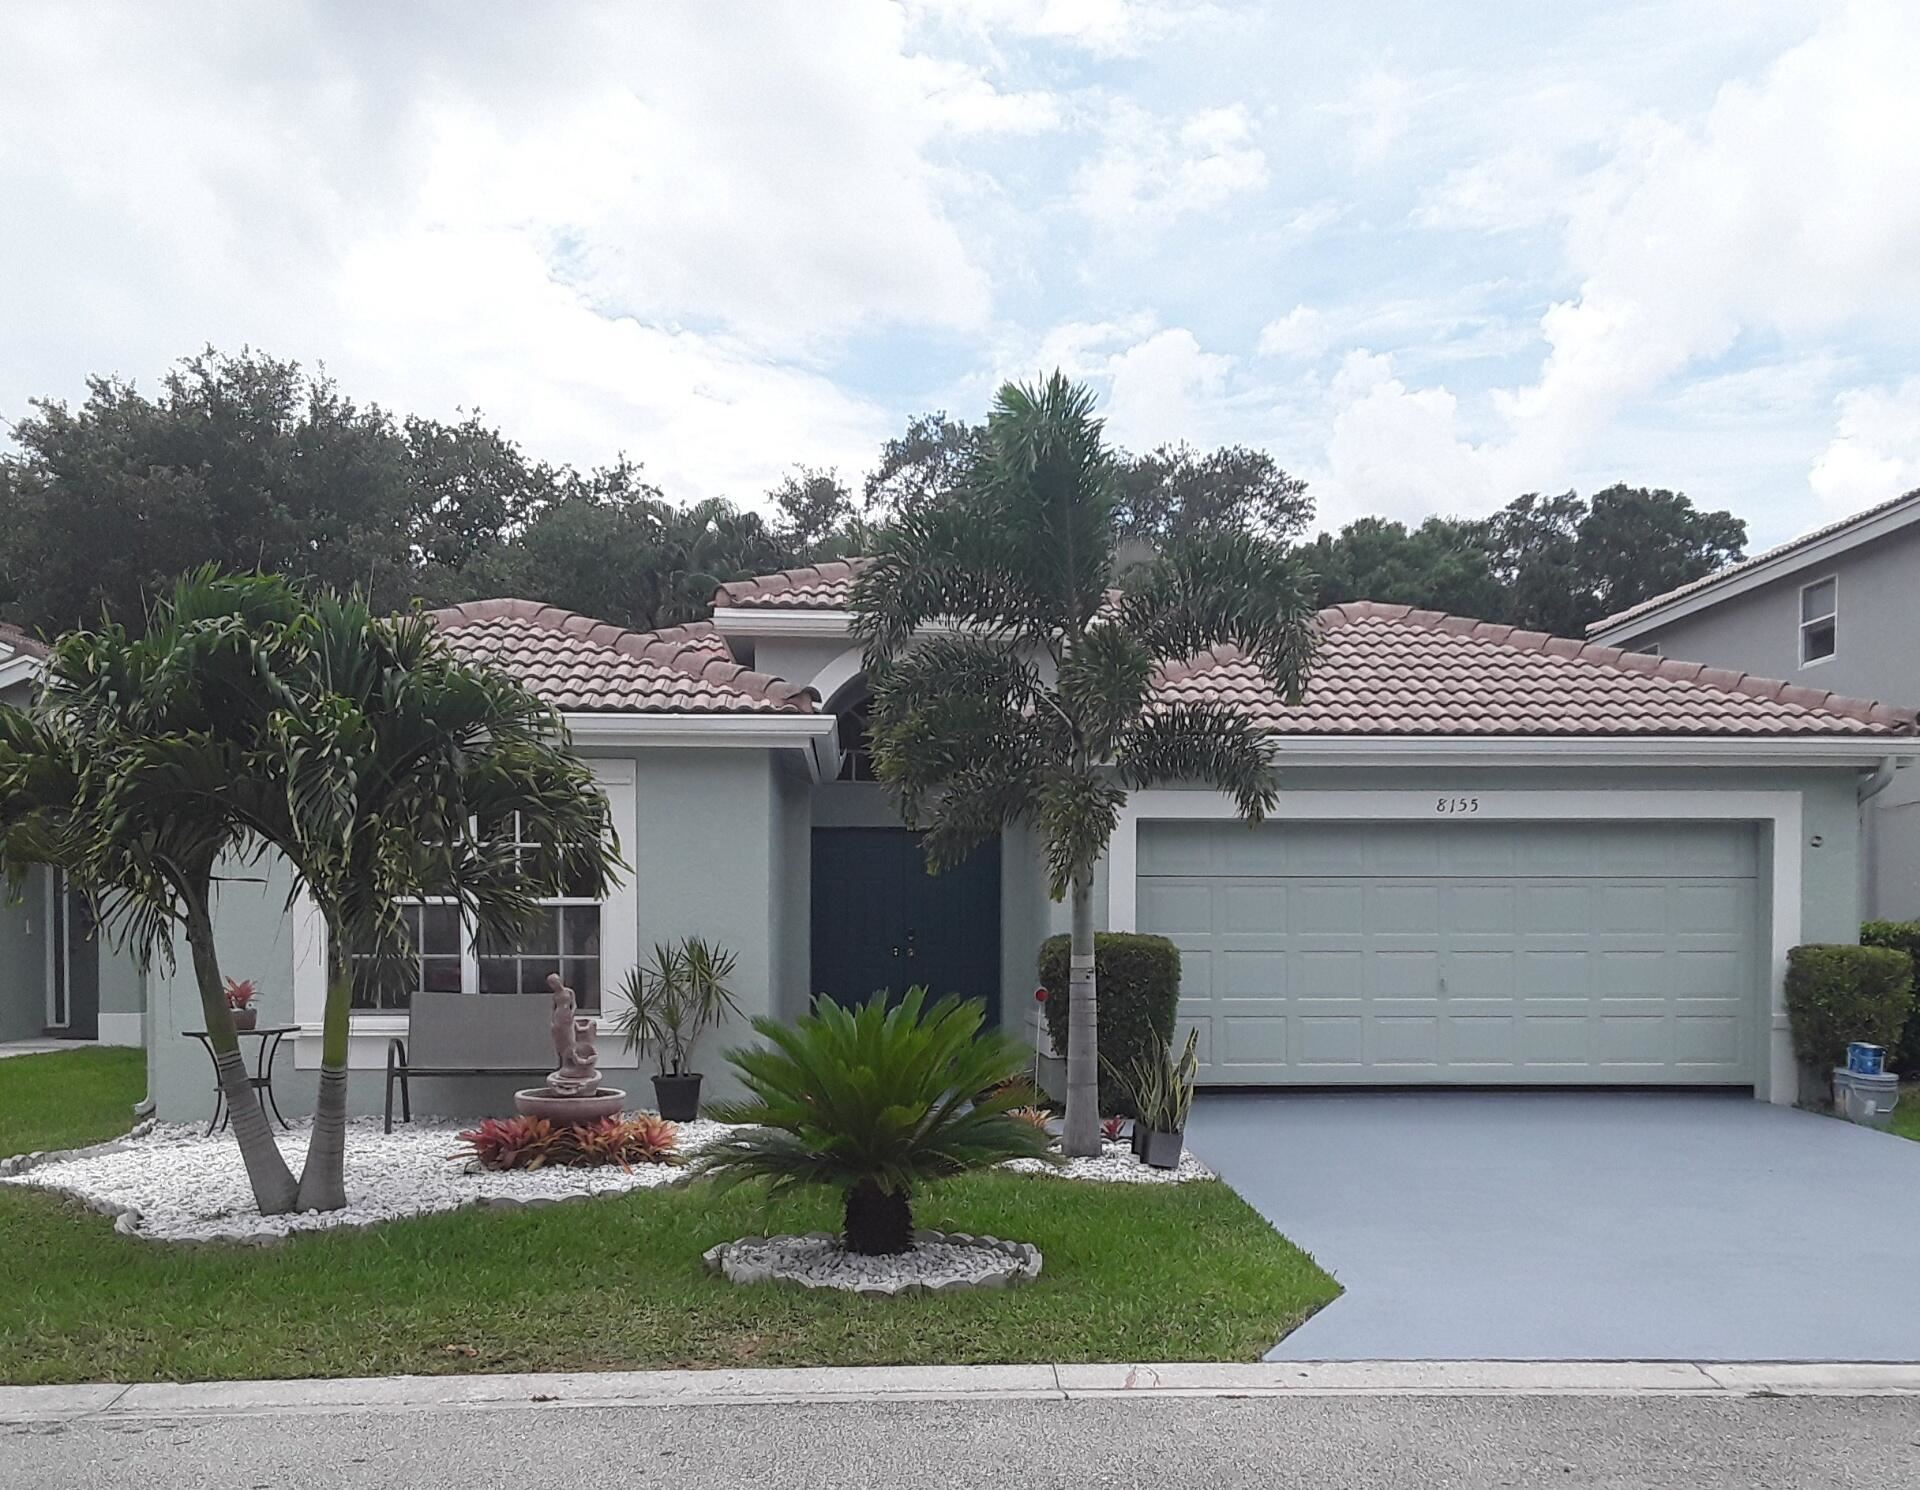 8155 Mystic Harbor Circle Circle, Boynton Beach, FL 33436 - MLS#: RX-10745863